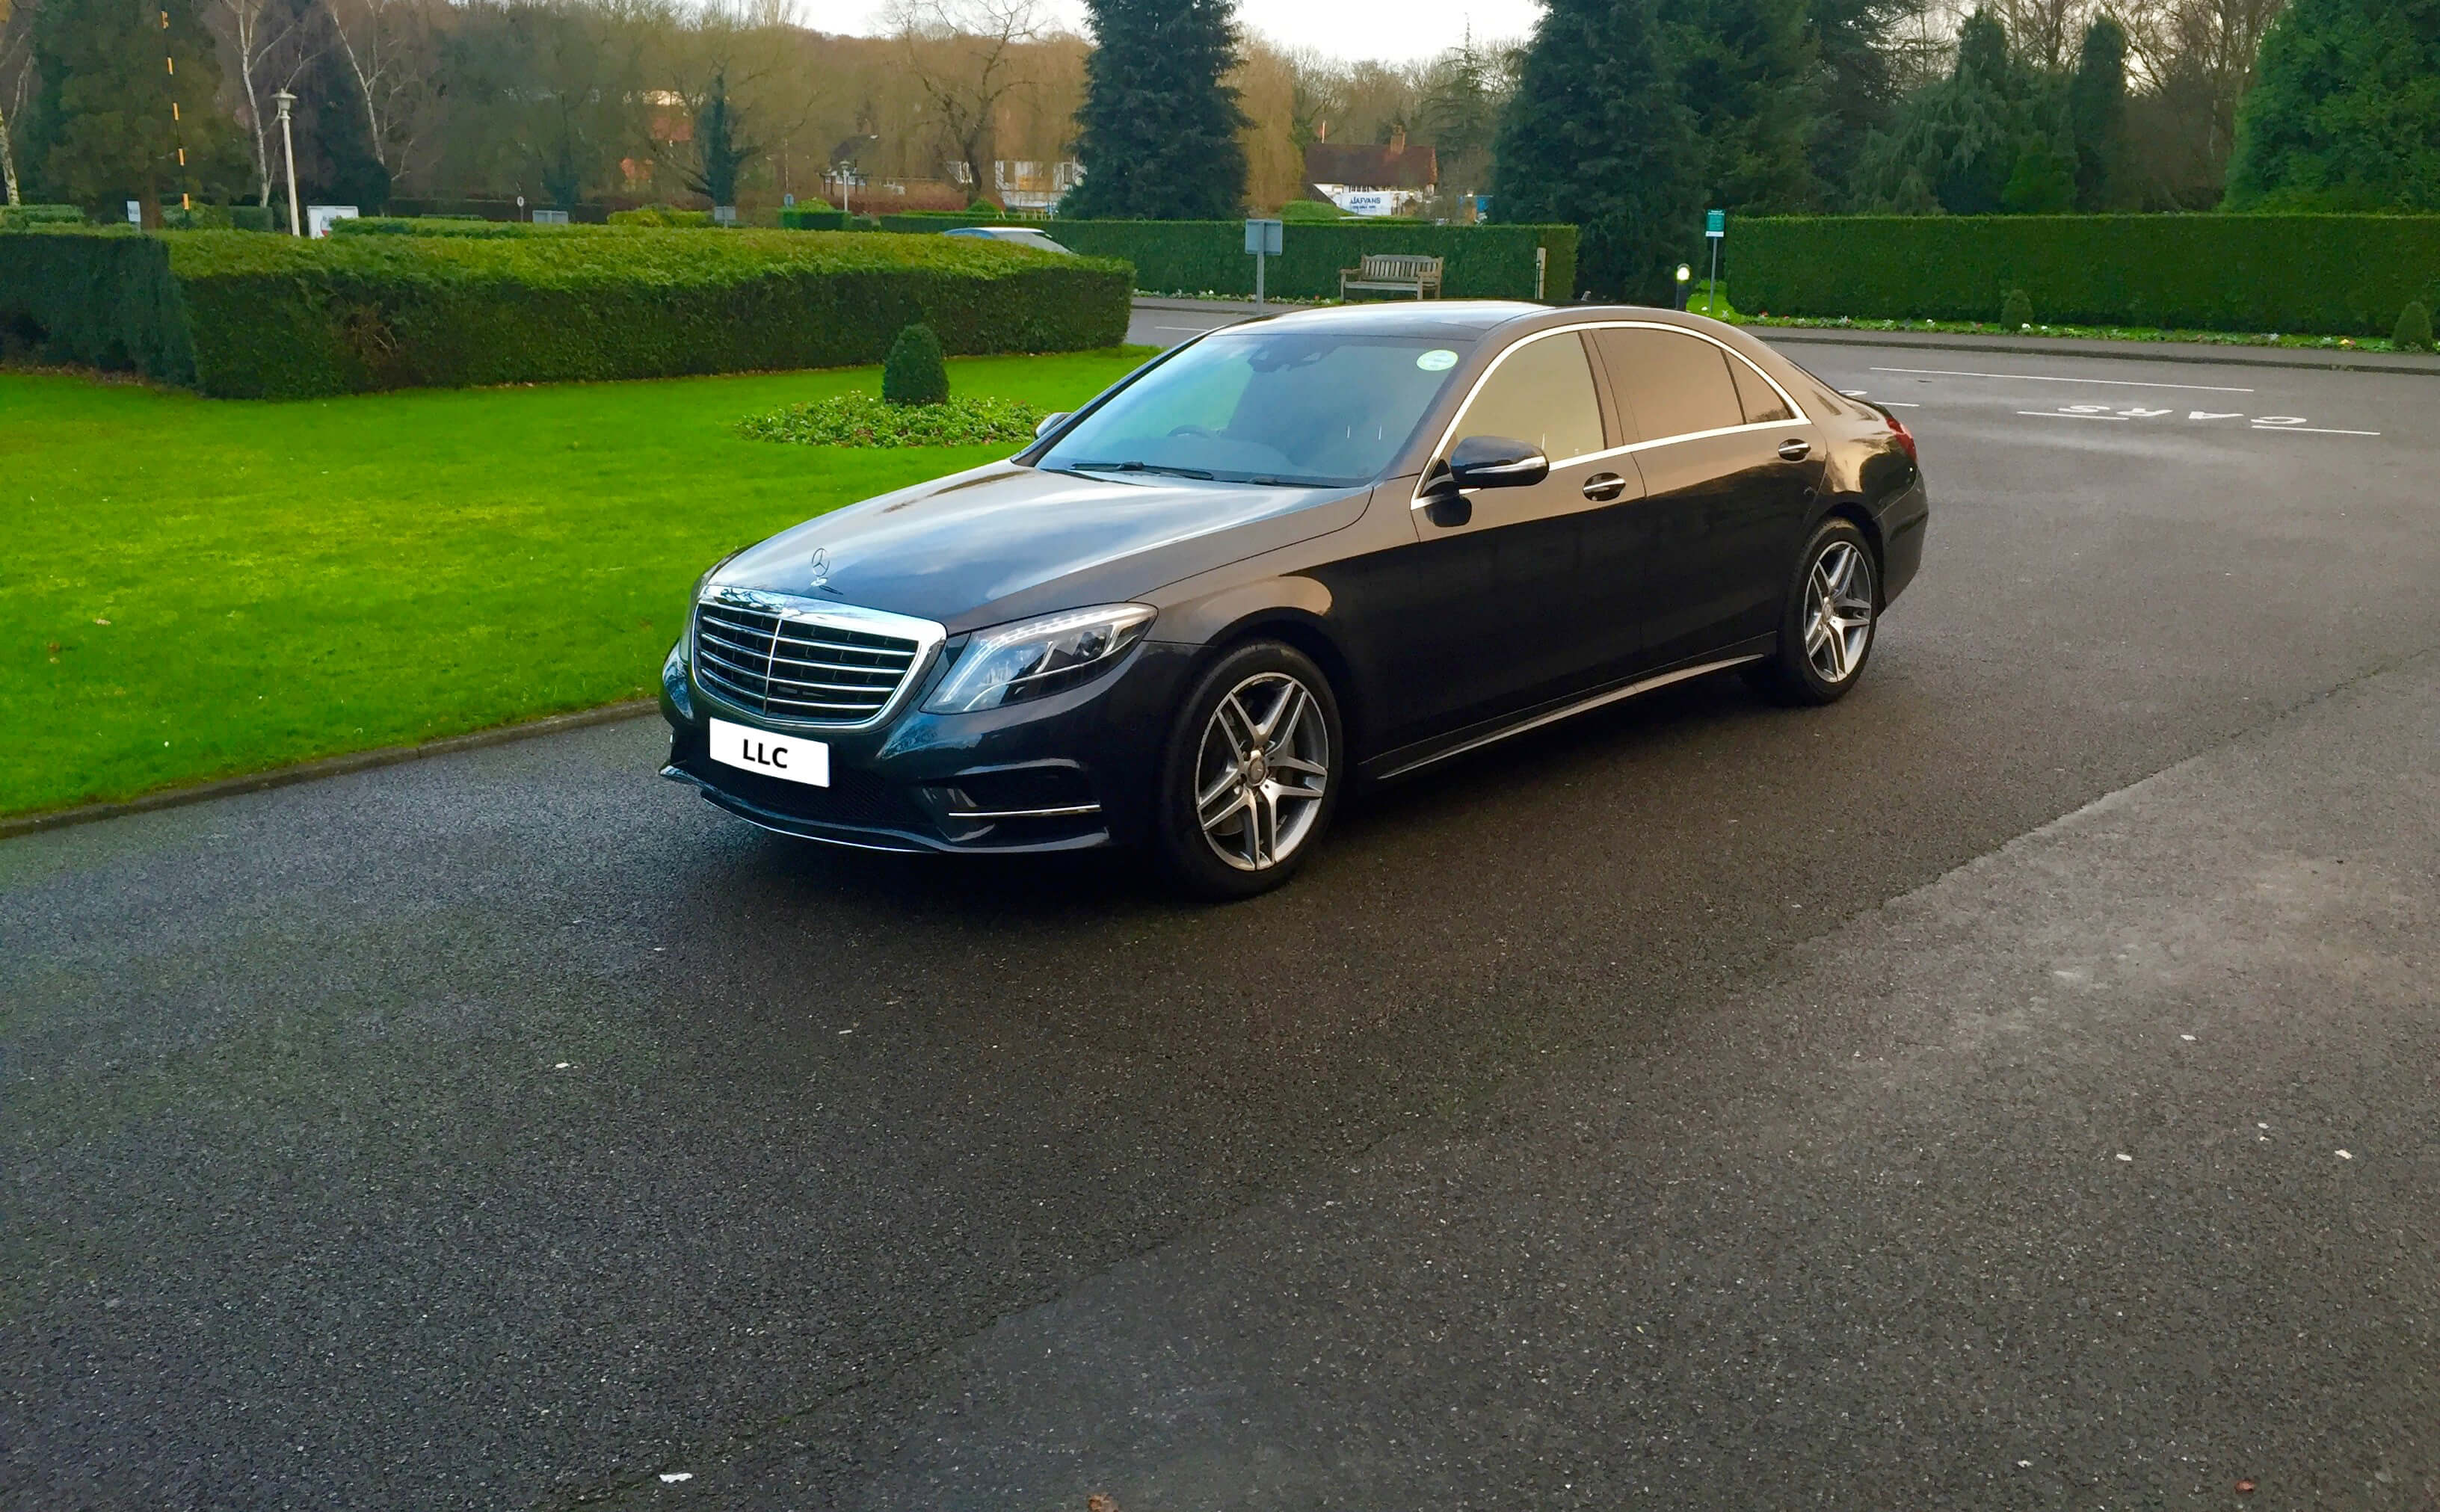 Mercedes S Class - Luxury Chauffeur Vehicle